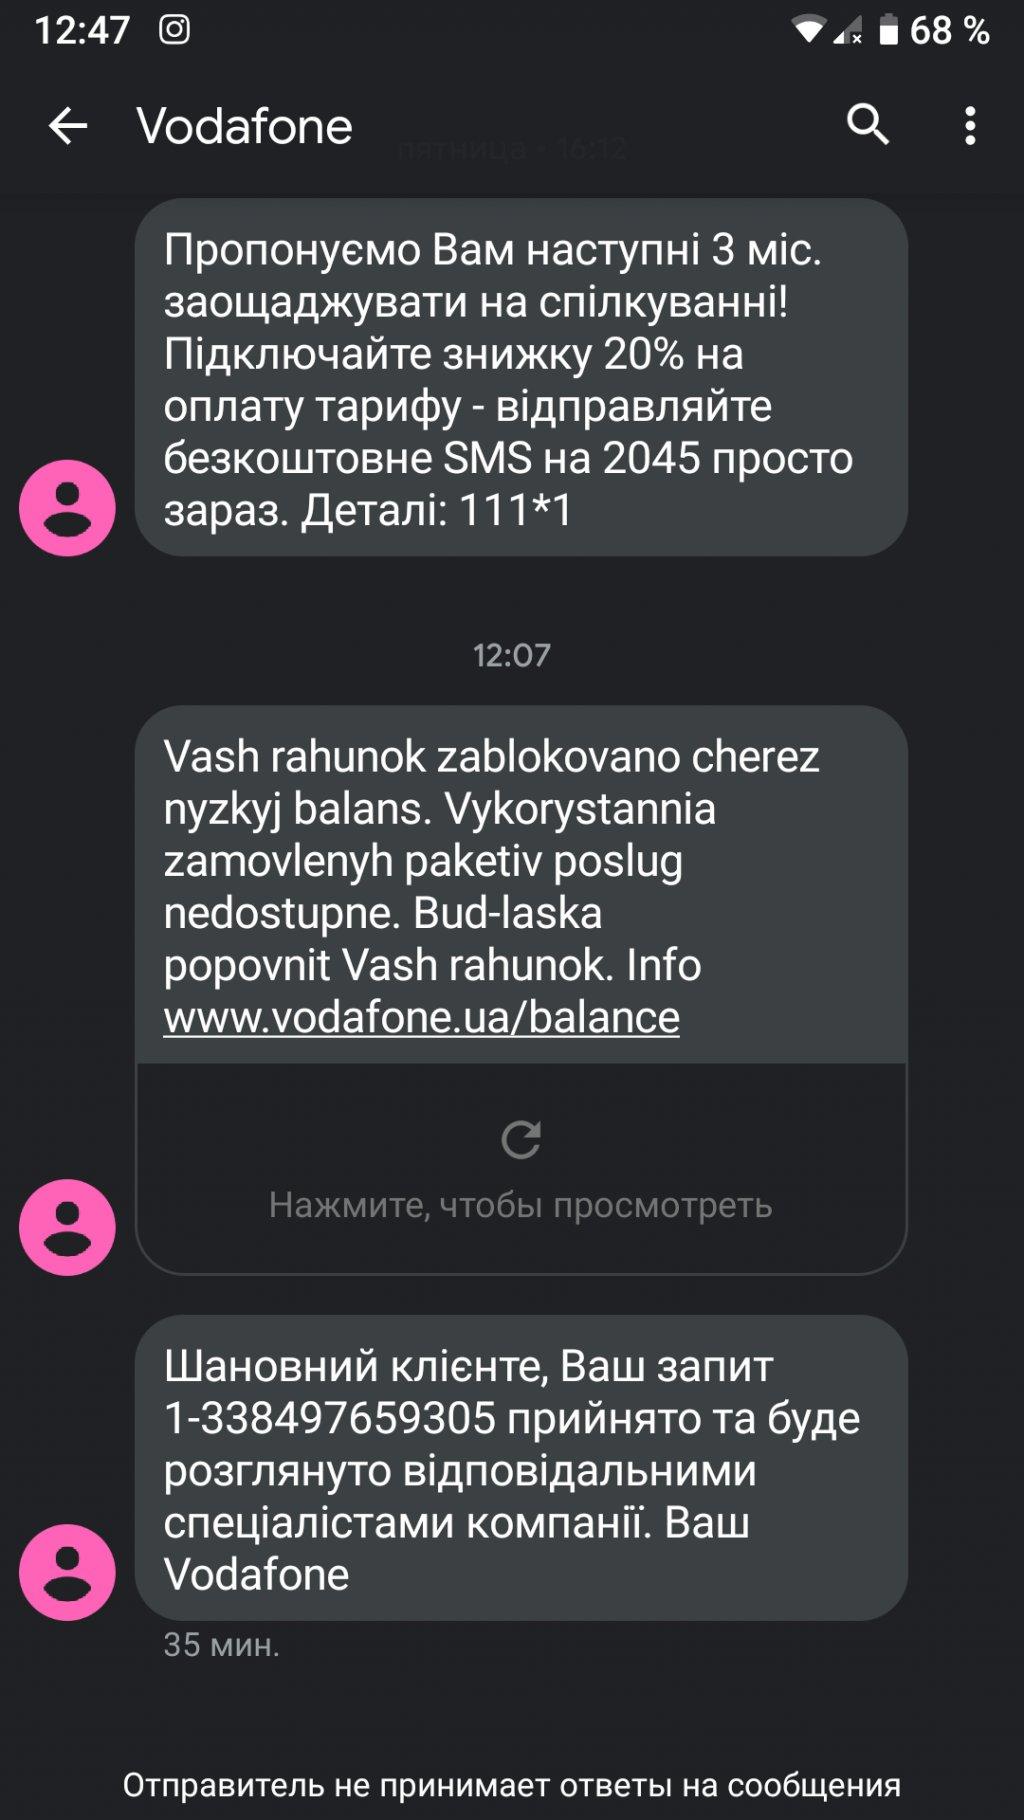 Vodafone Украина - кусок го*на а не оператор!